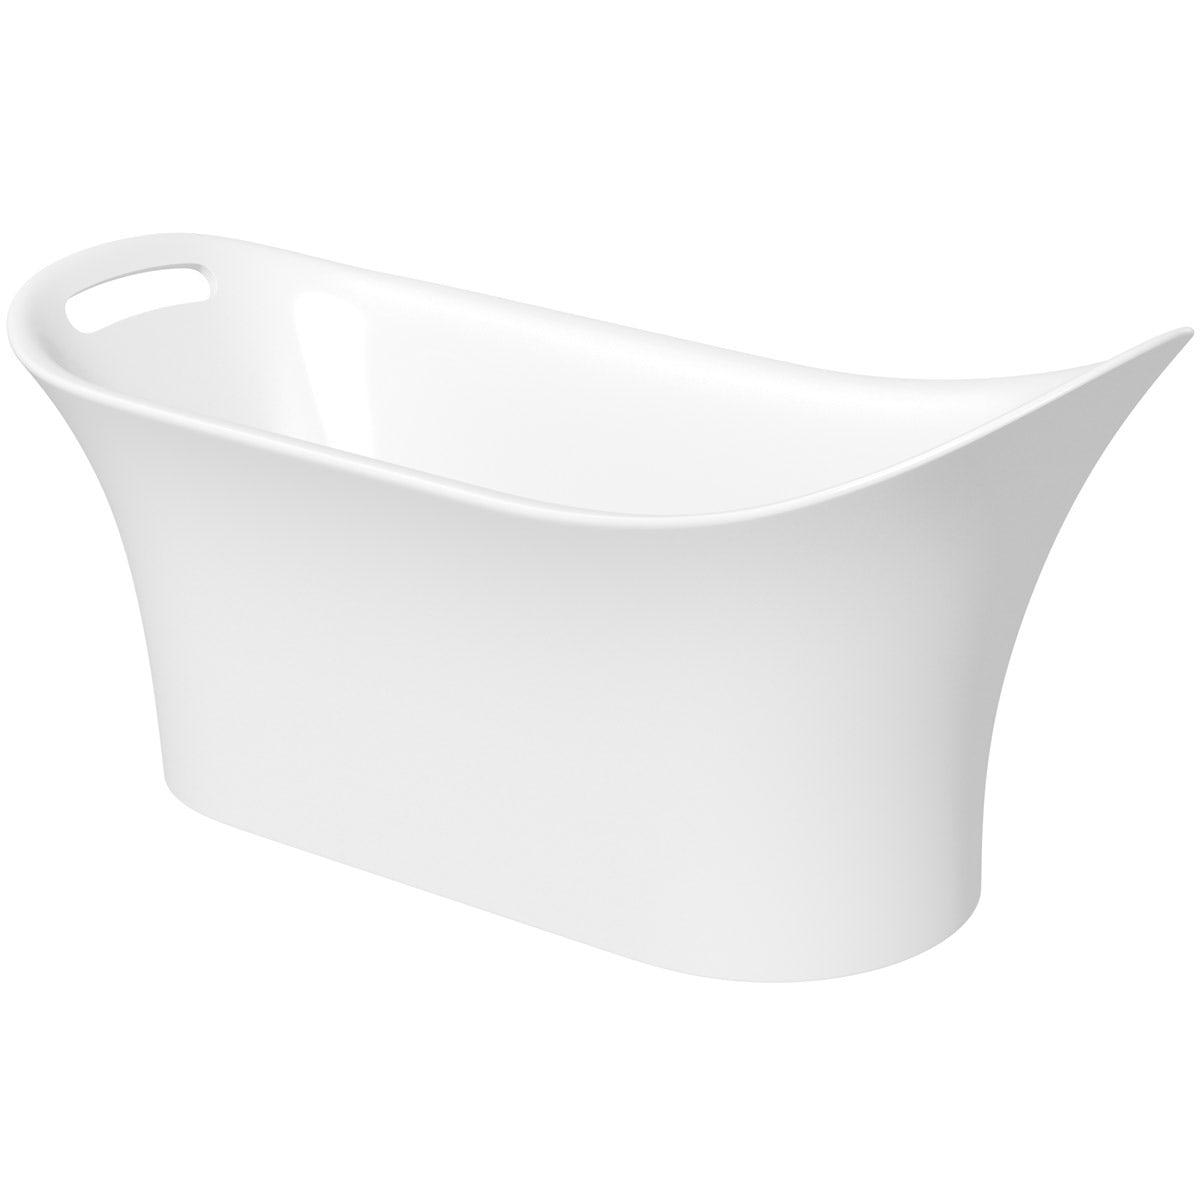 Mode Heath freestanding bath 1600 x 700